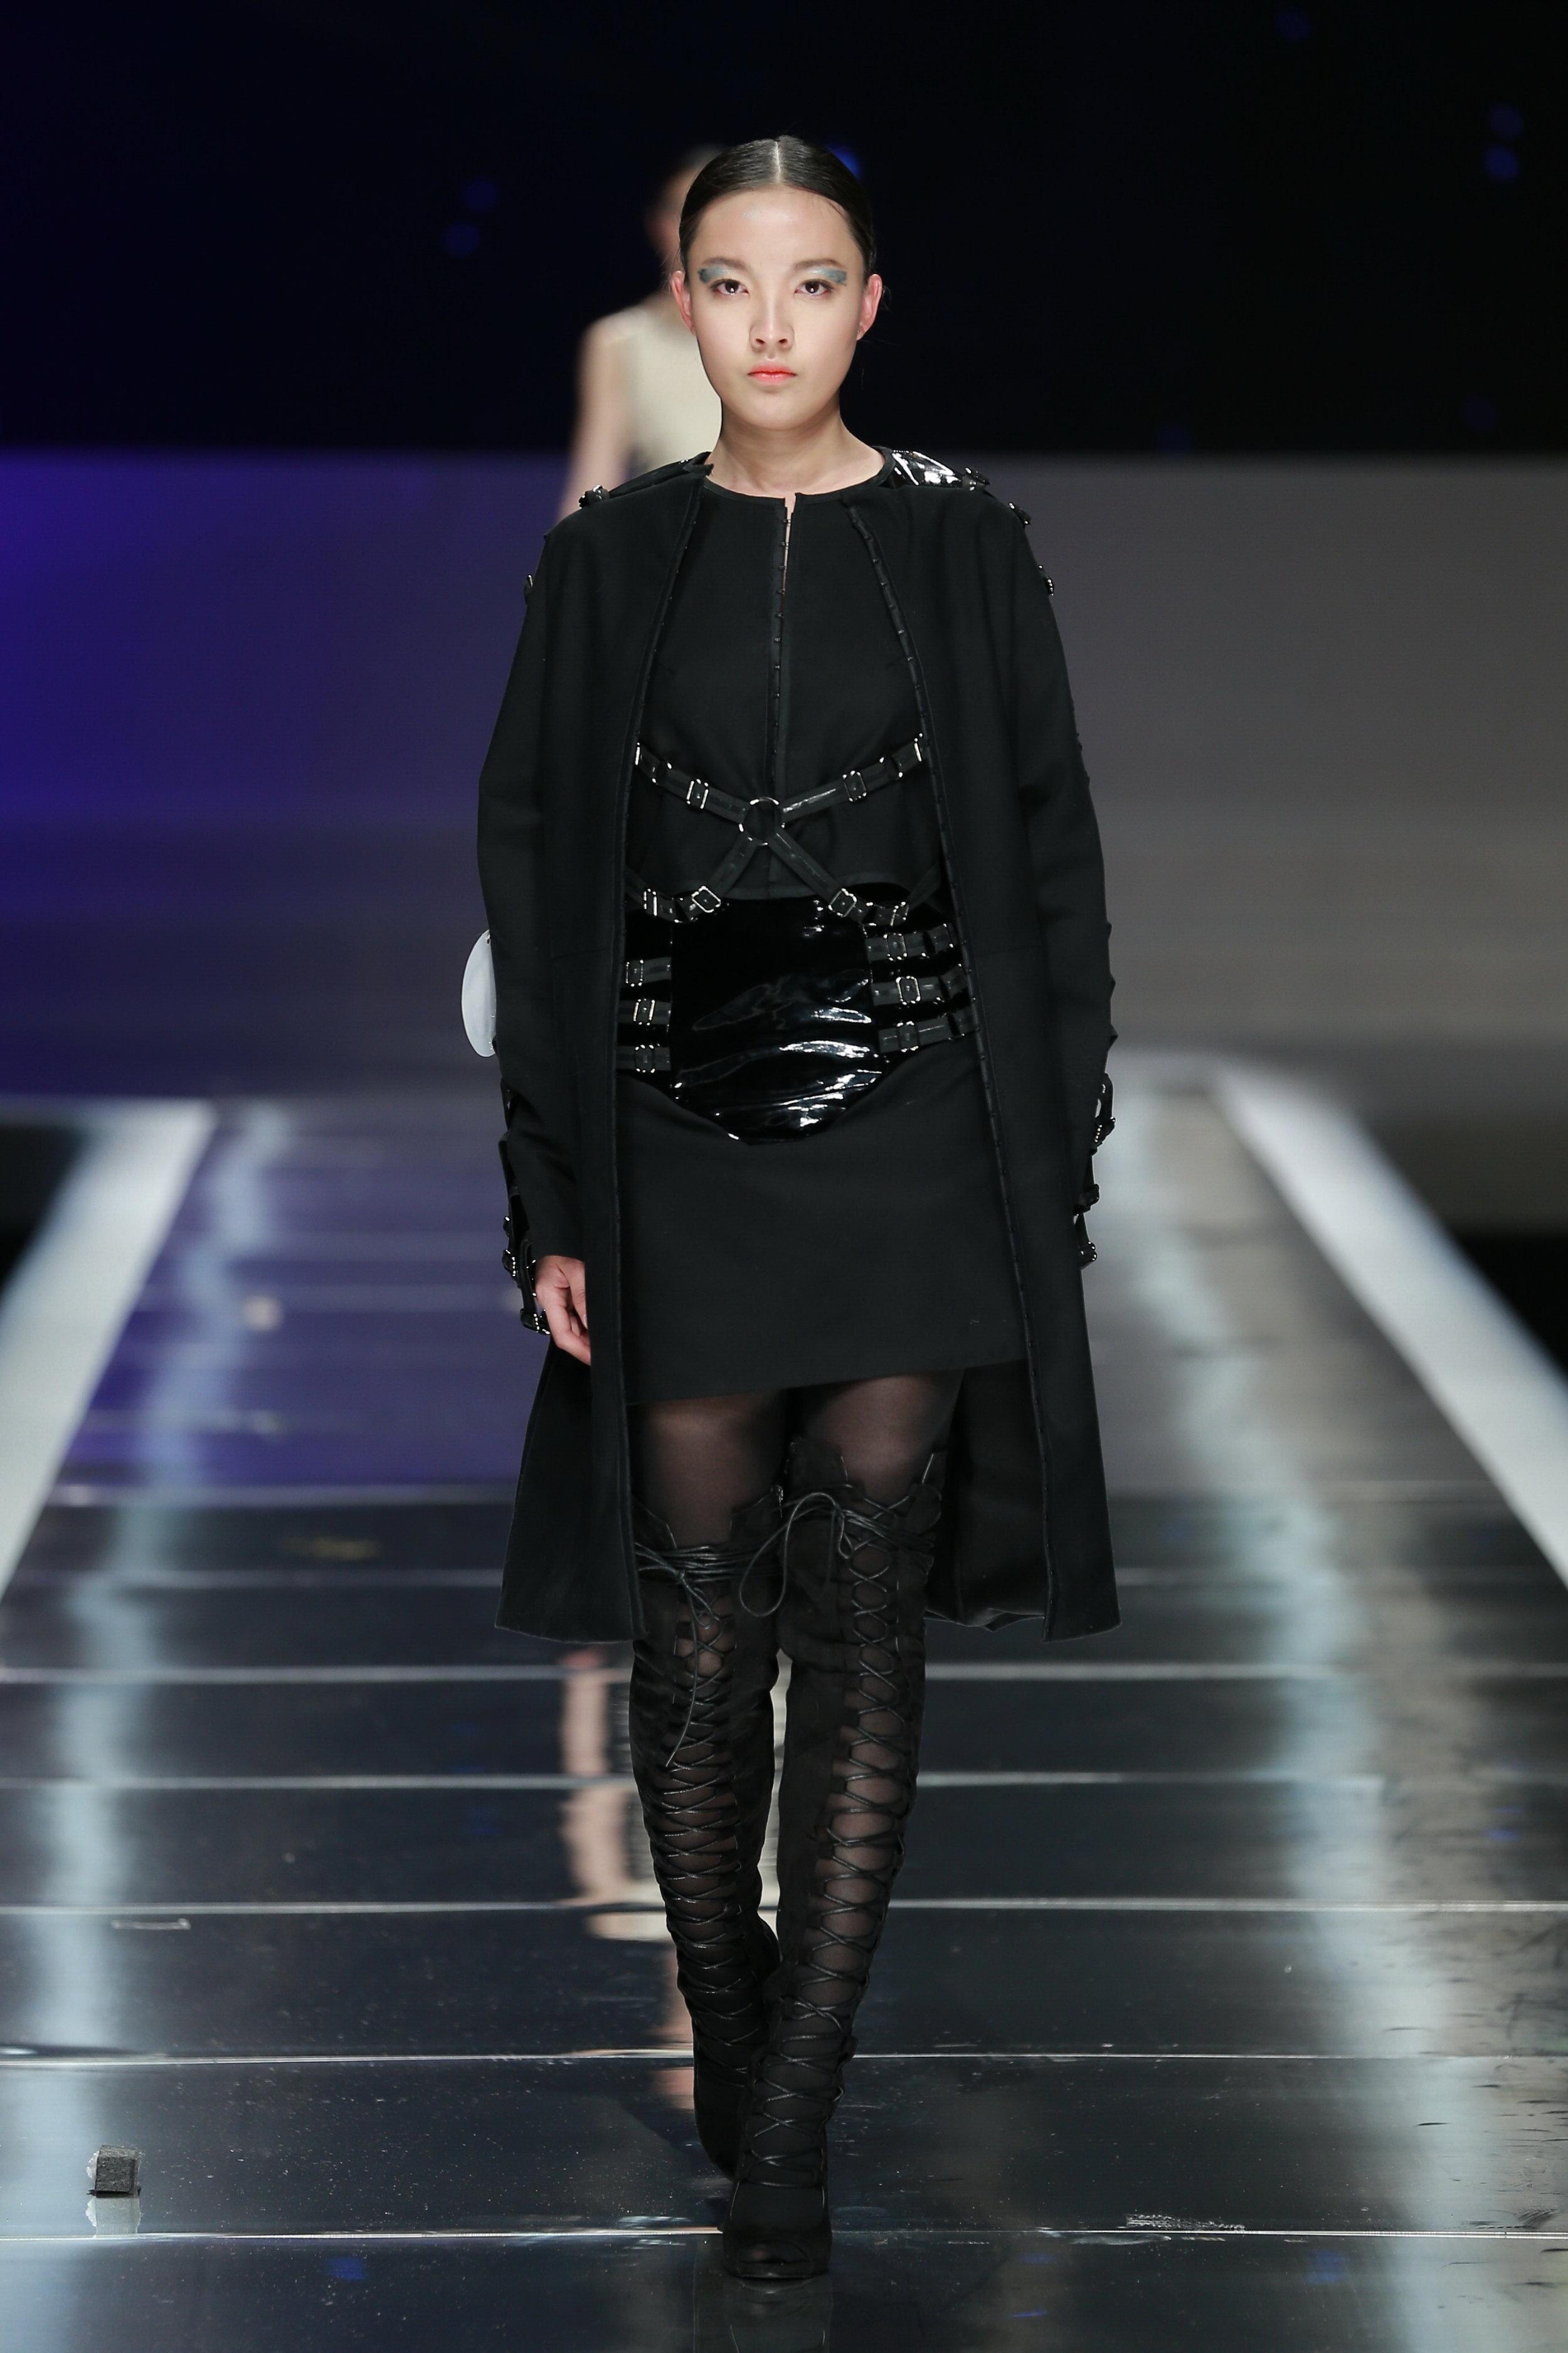 China-Look1-Skirt-Top-Coat-Award-Fashion-Week-Show-rock.JPG